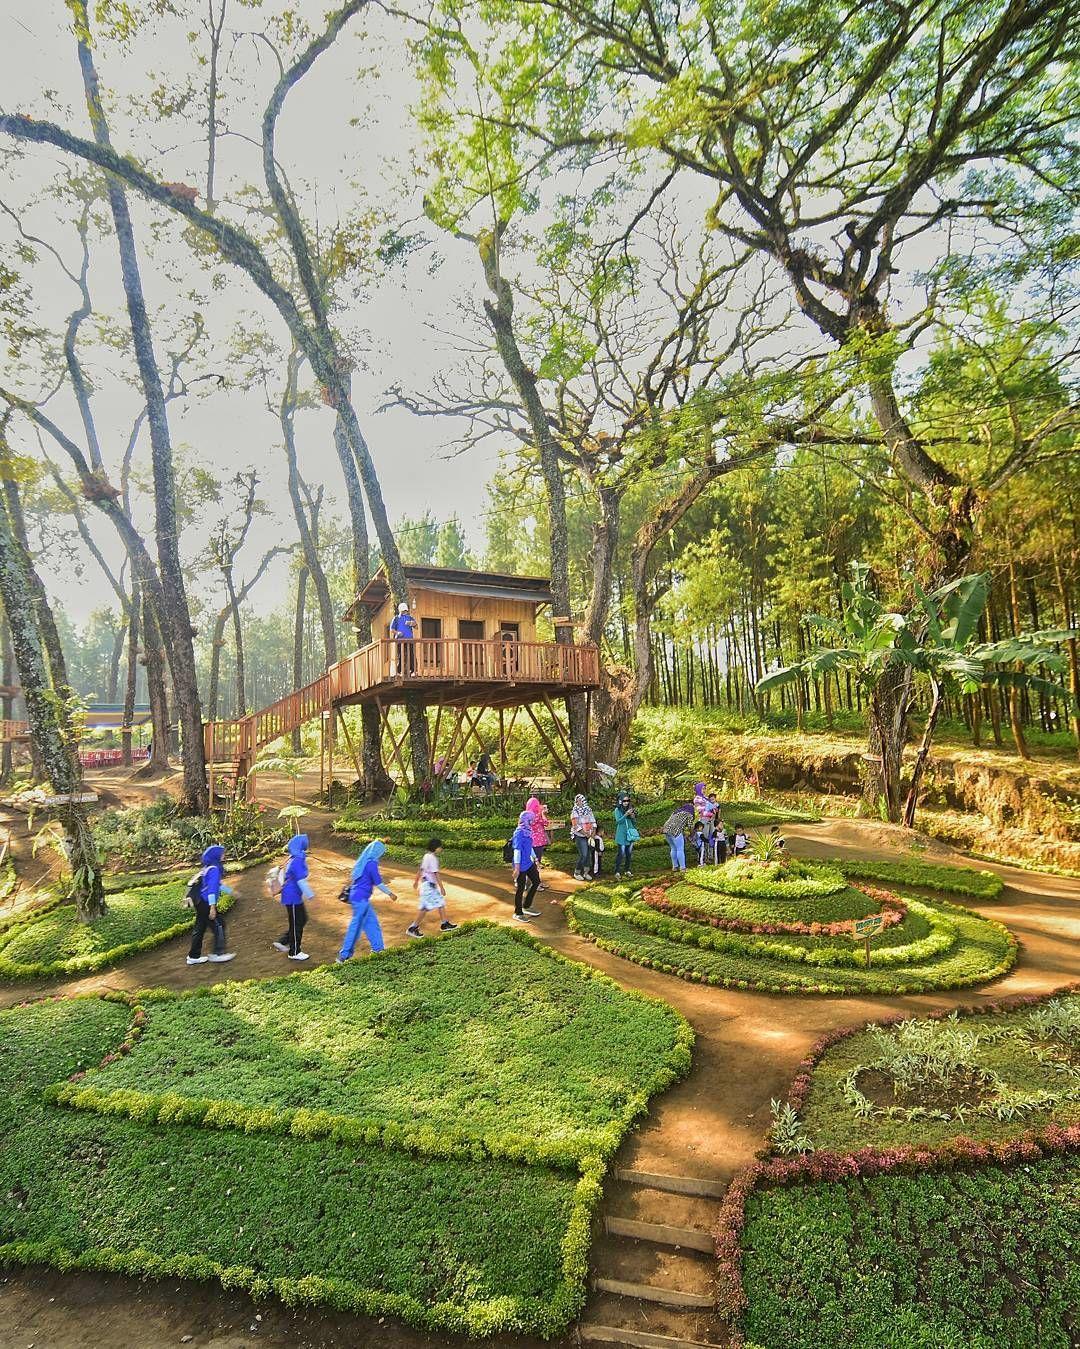 Wisata Anak Di Malang : wisata, malang, Tempat, Wisata, Murah, Malang, Jarang, Banyak, Orang